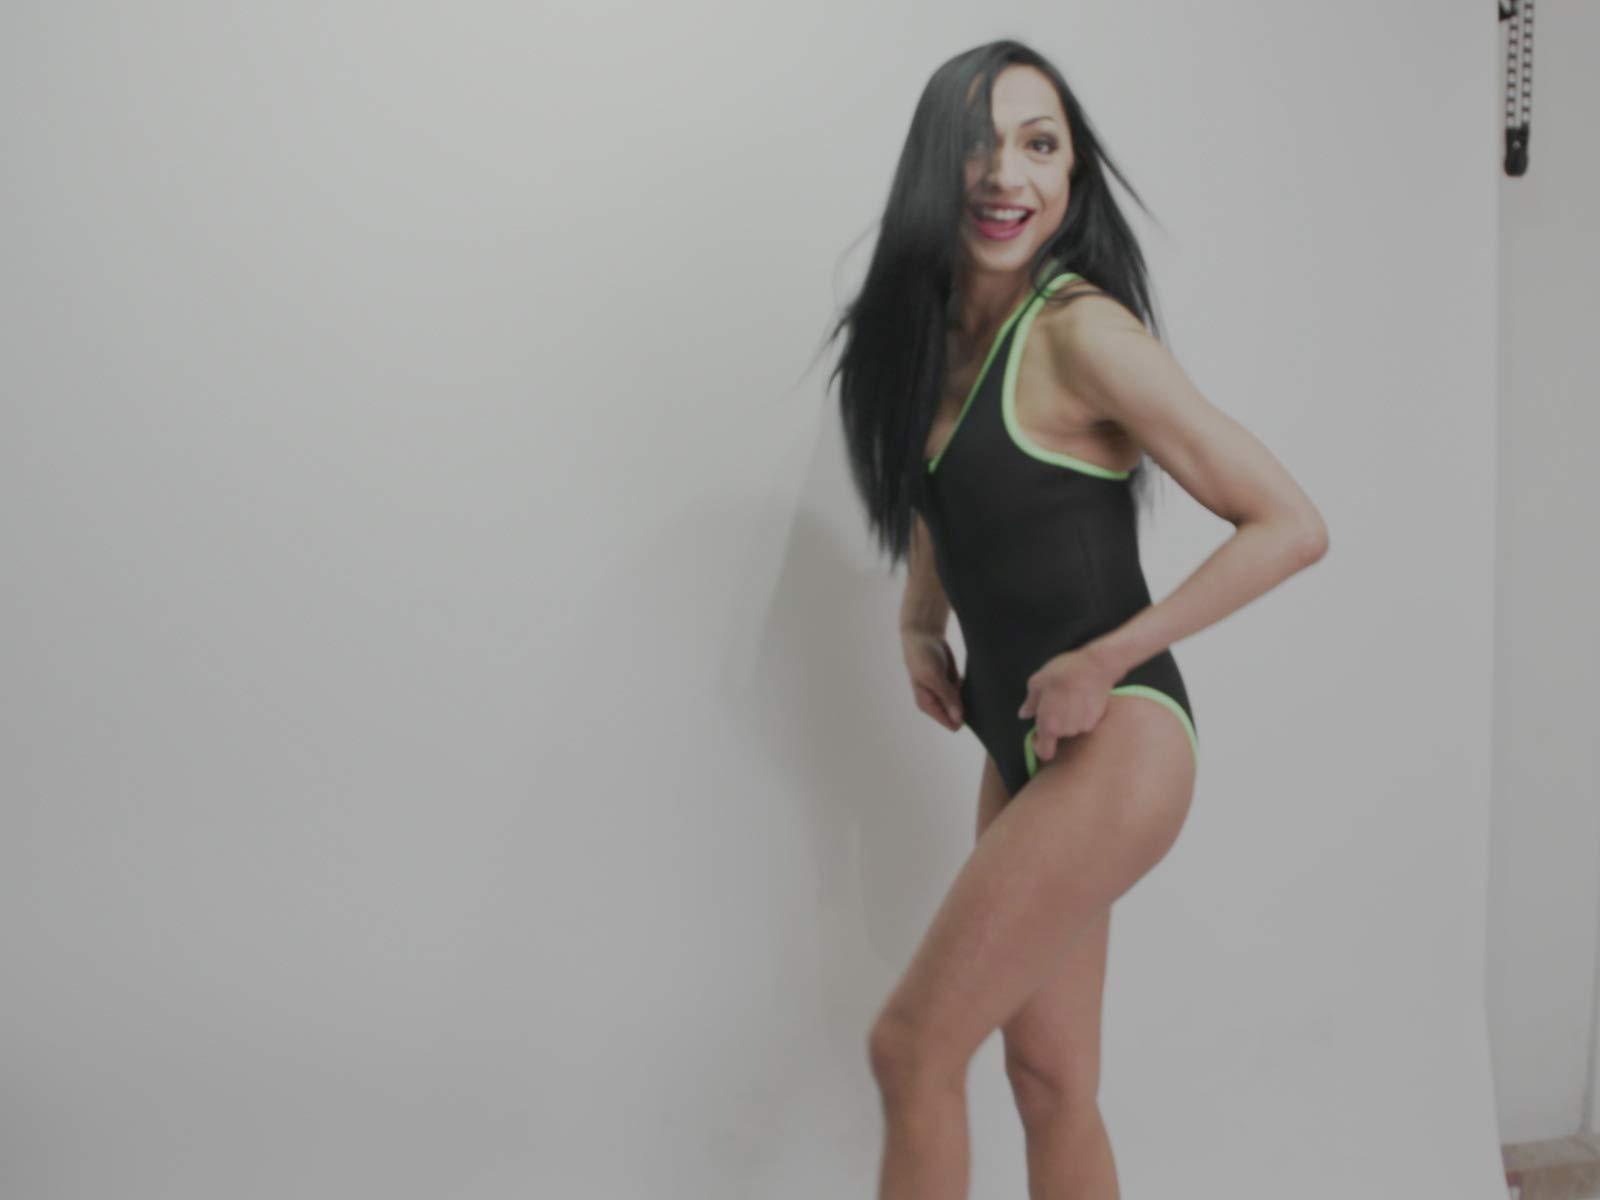 The Crazy World of Transgender Sarah Wenno - Season 2